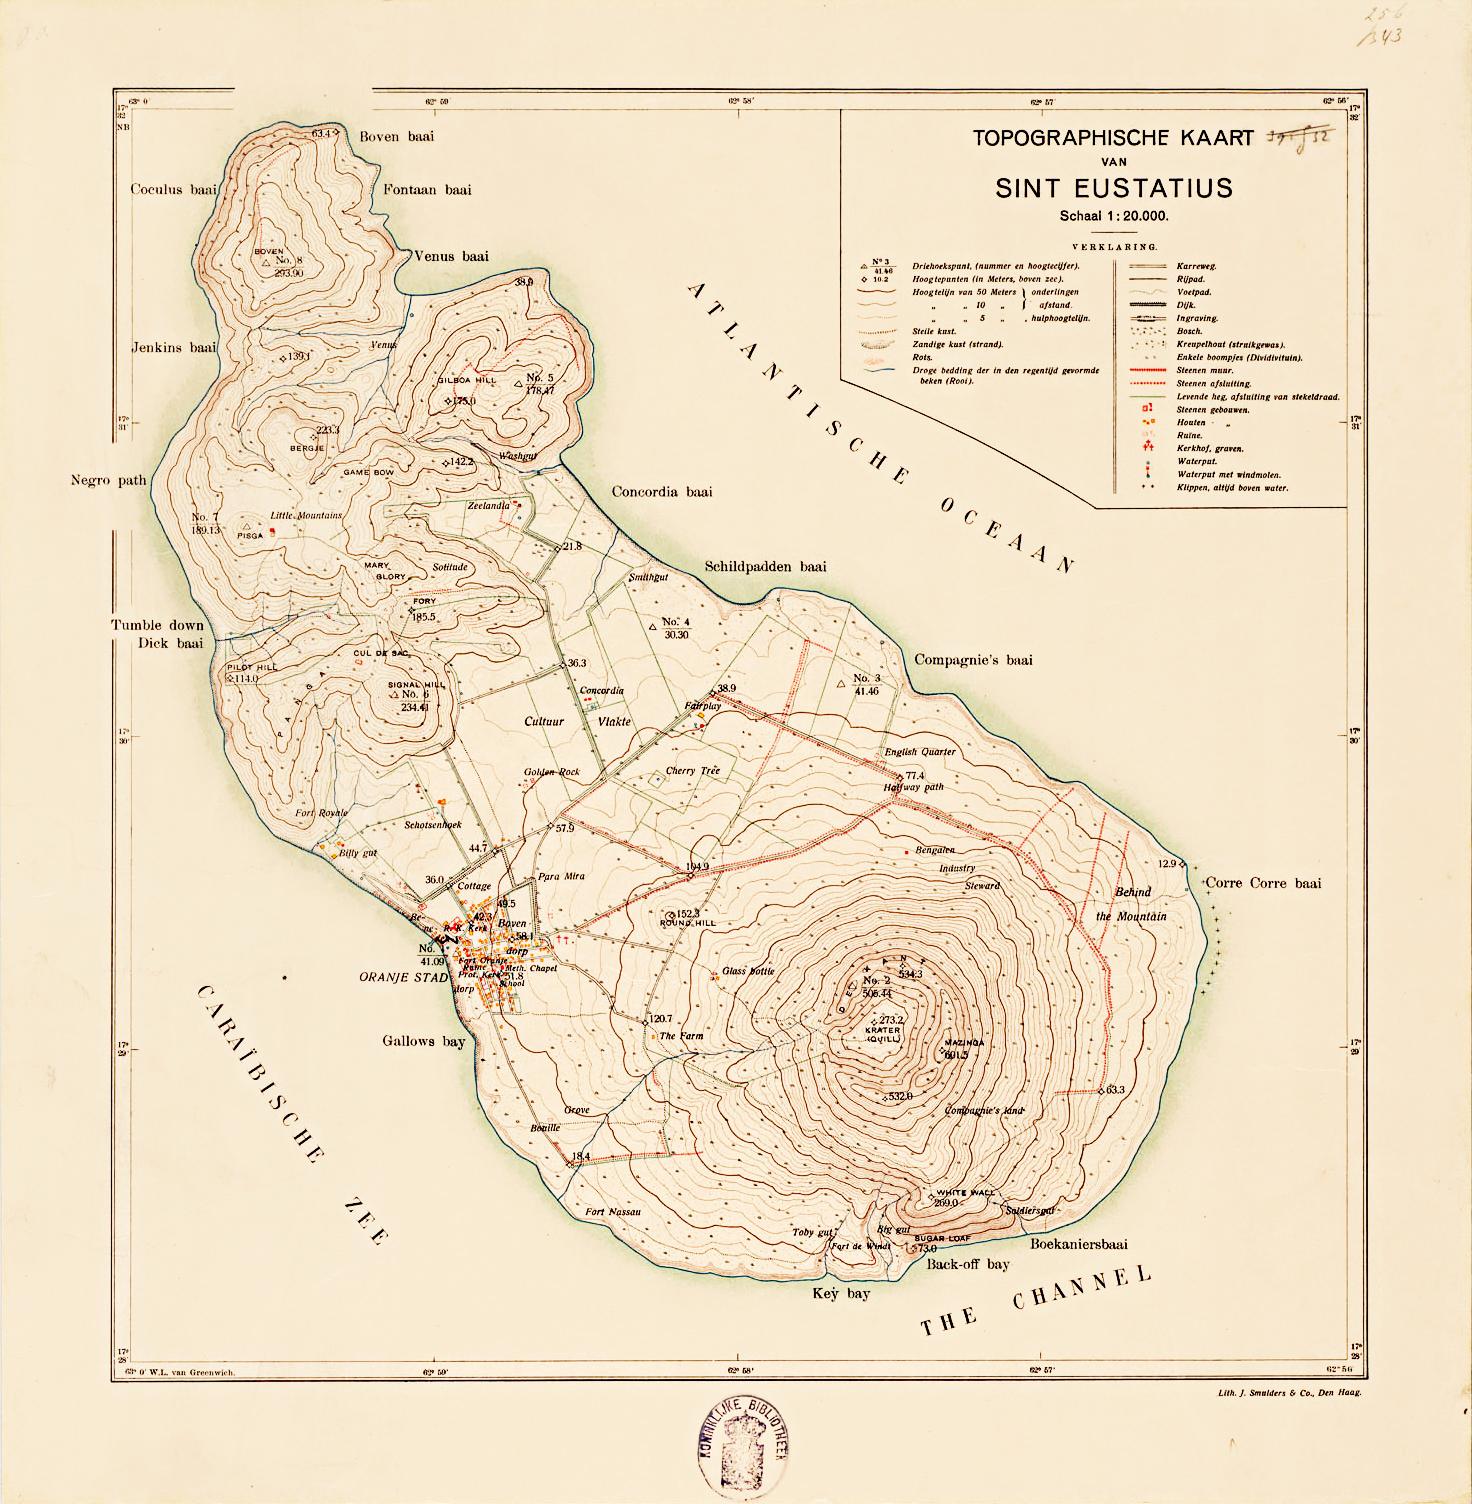 FileSint Eustatius Map Bjpg Wikimedia Commons - Sint eustatius map